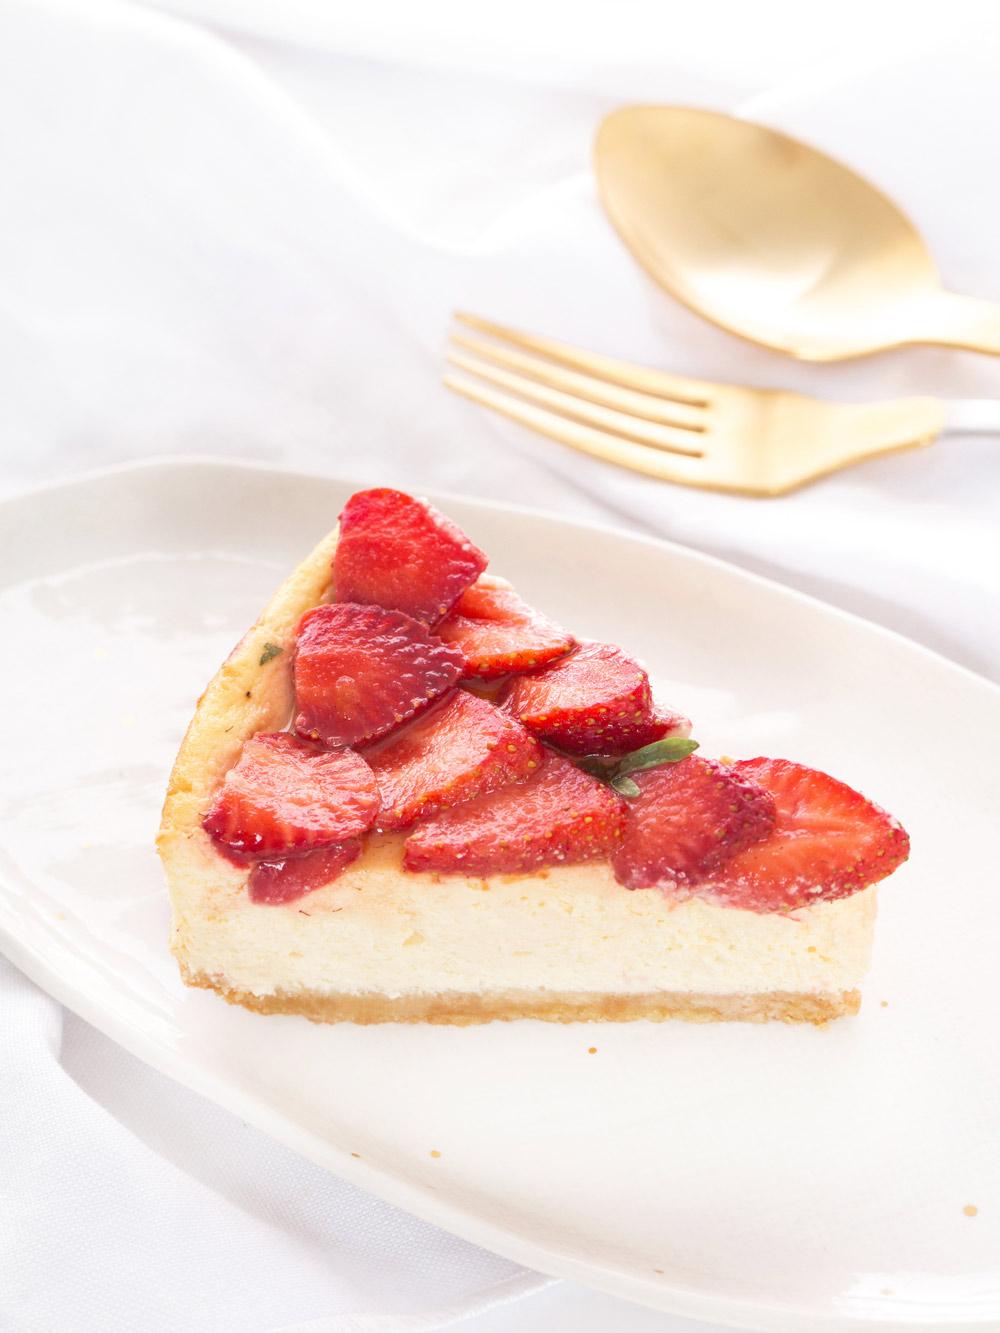 Blanccoco_Recette_Cheesecake_Fraise_Basilic-8